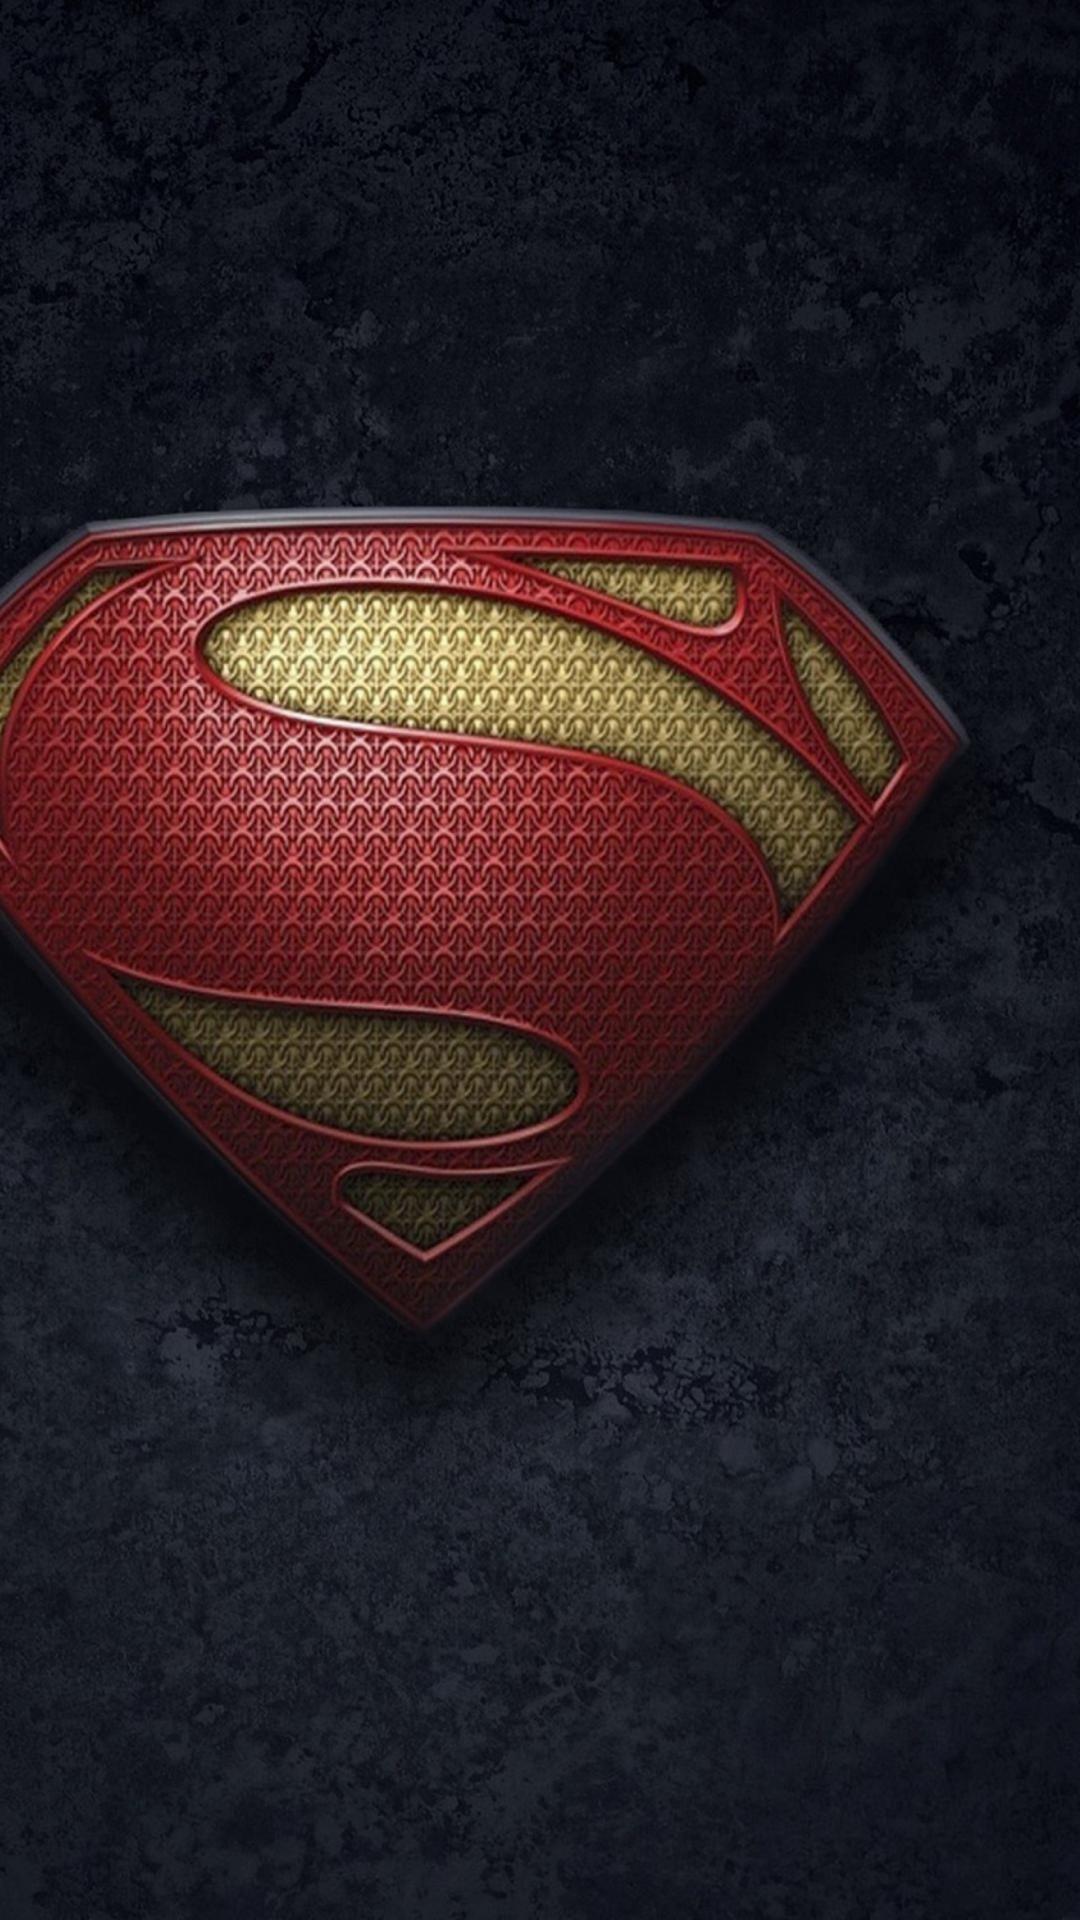 Superman iPhone Wallpaper HD 71 images 1080x1920